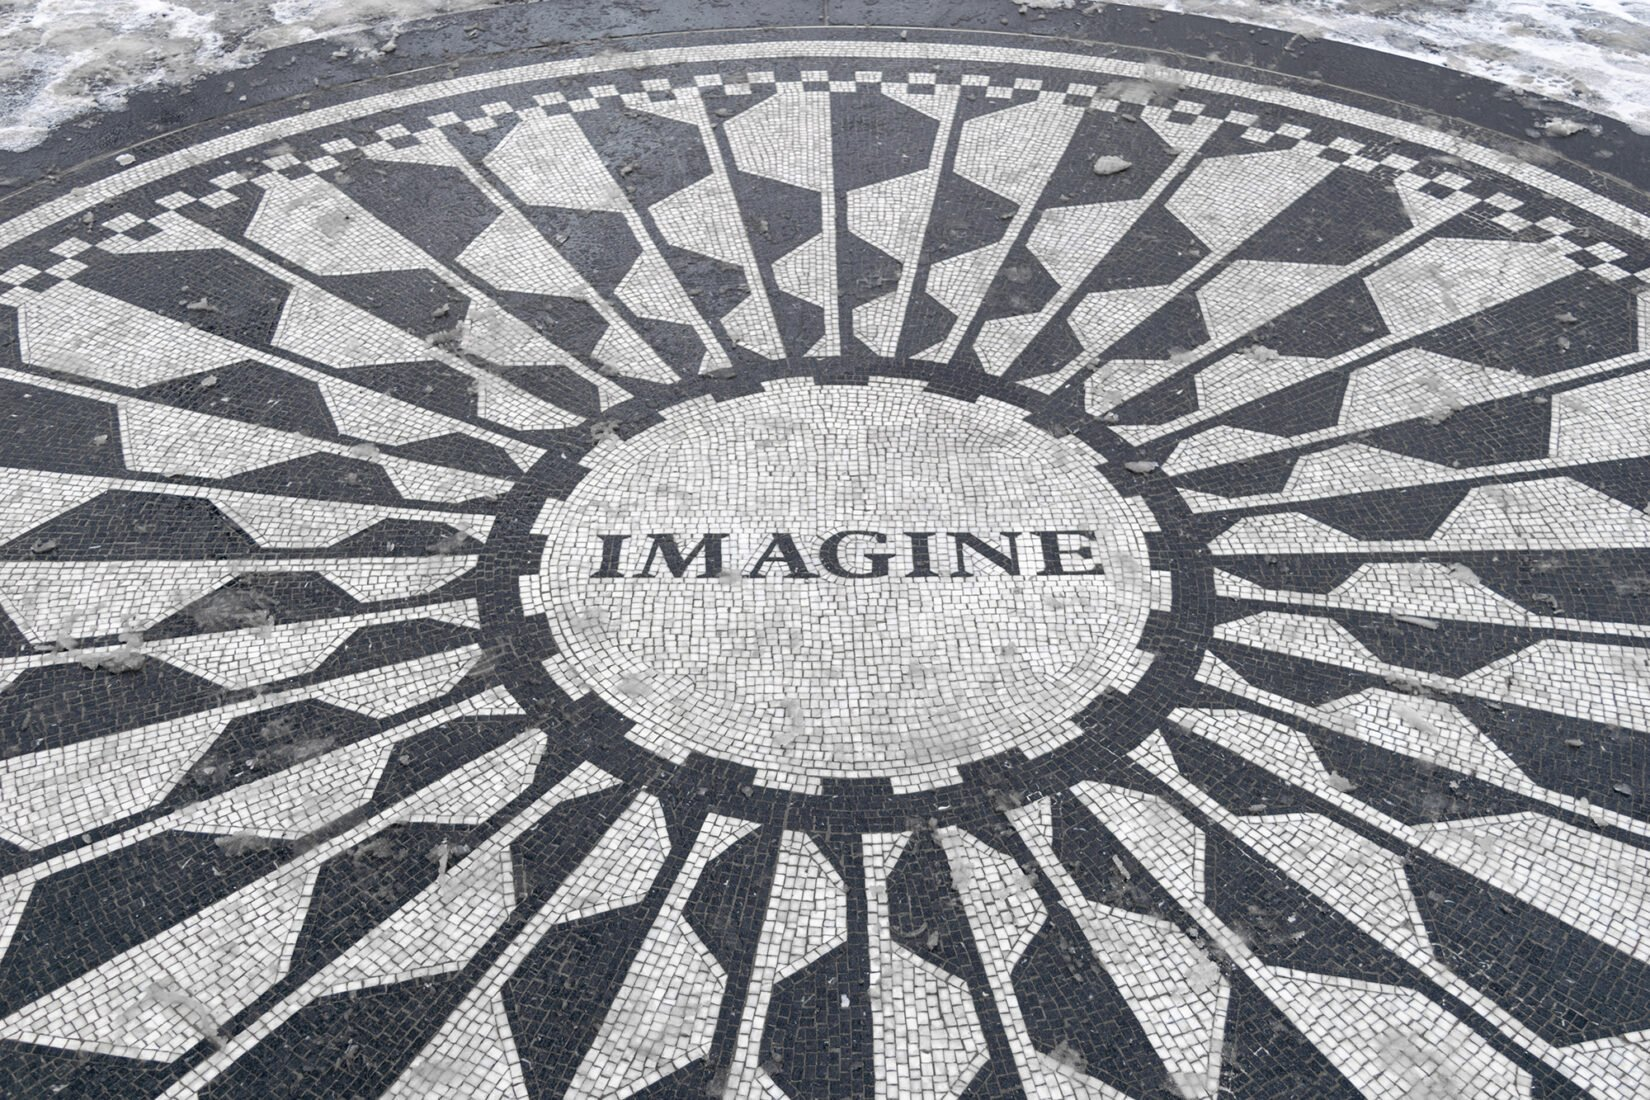 Imagine Mosaic 20190220 002